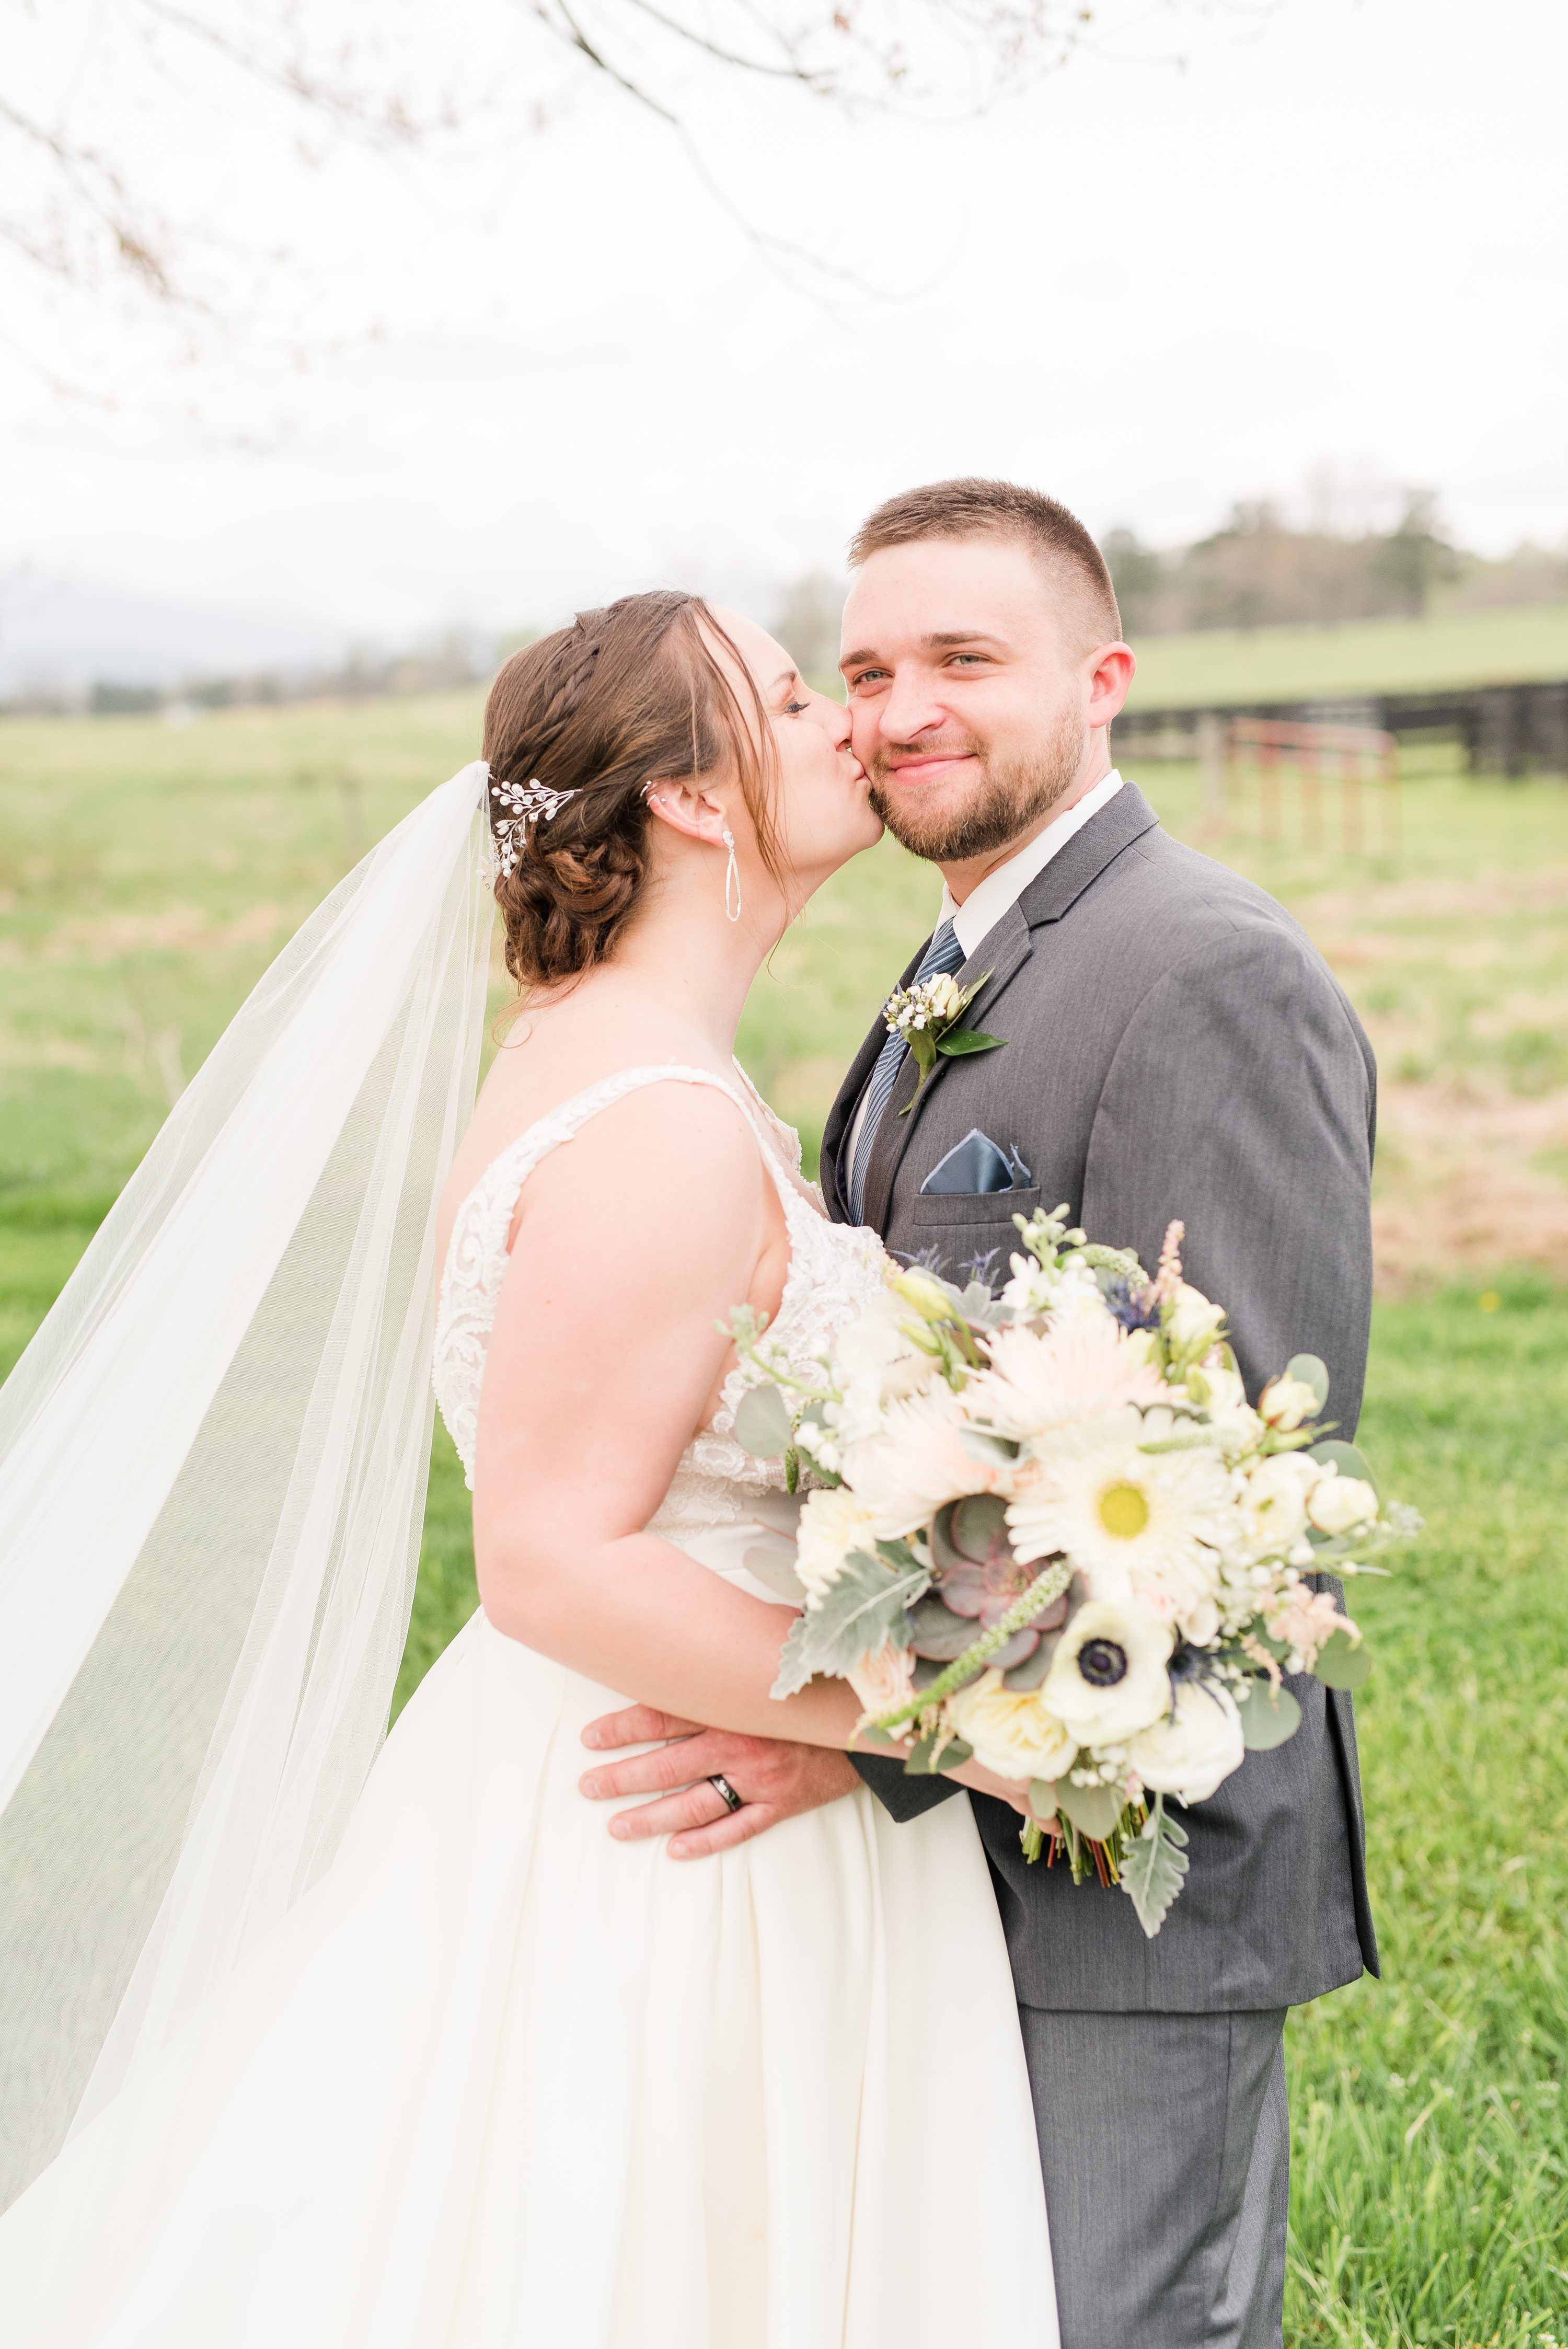 Blue Ridge Mountains Wedding,Spring Wedding,bride and groom,mountain wedding,edgewood barn